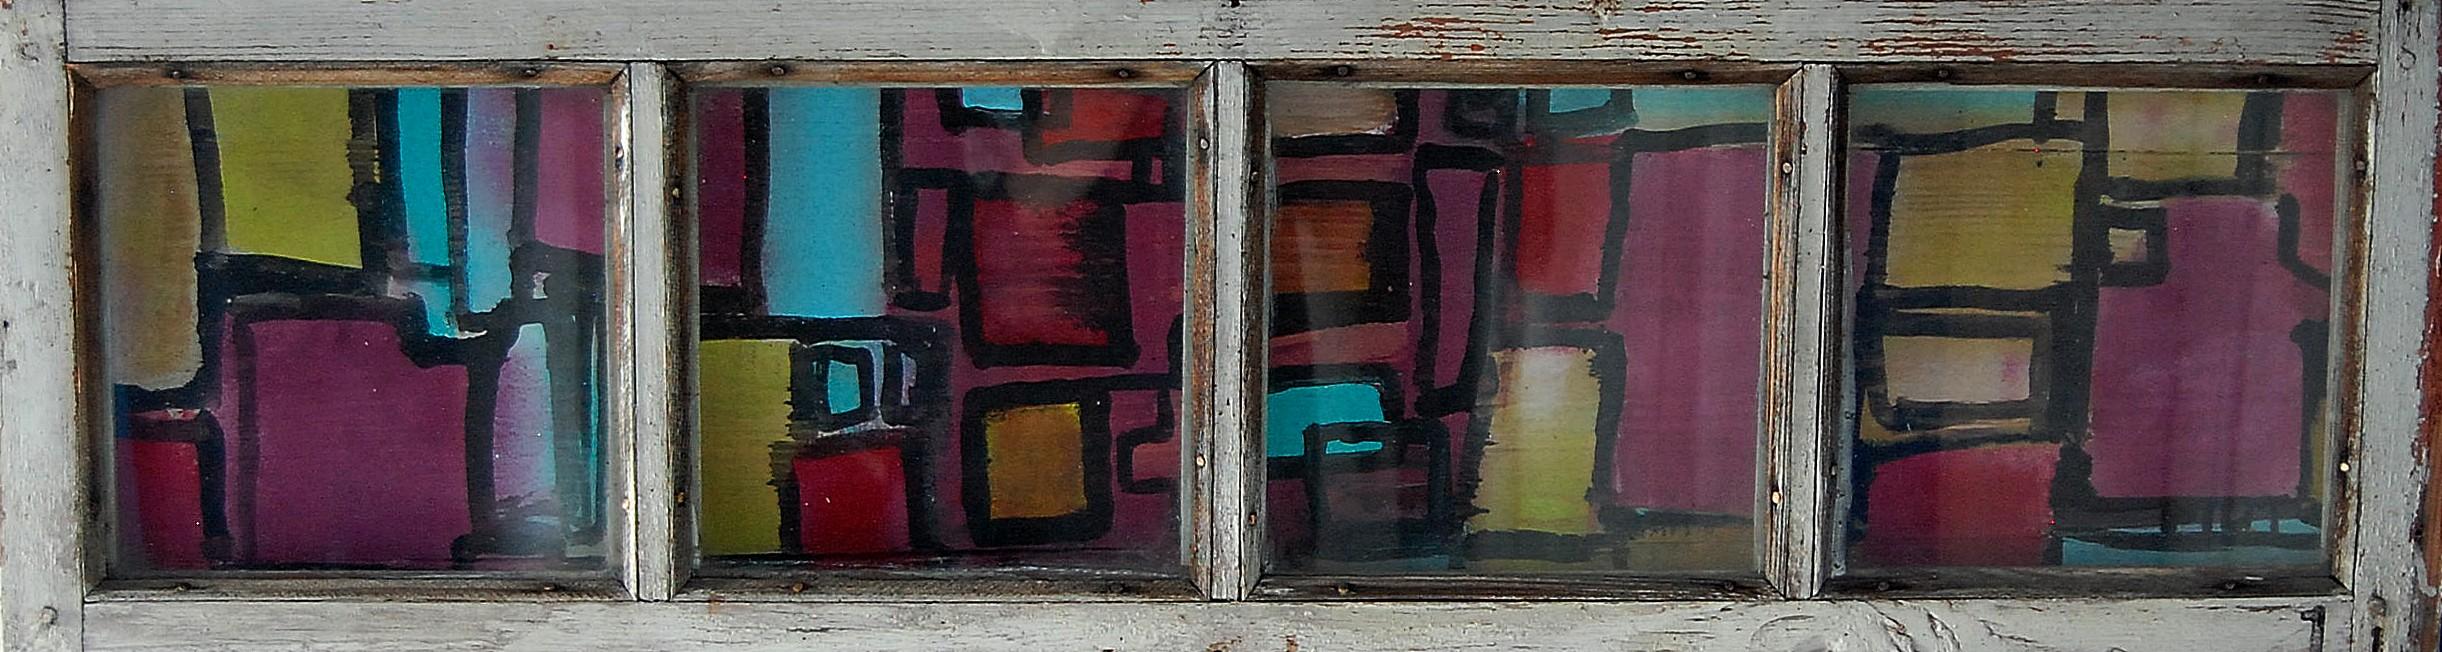 Abstrakcja IV akryl Tomasz Motloch motlochartcom